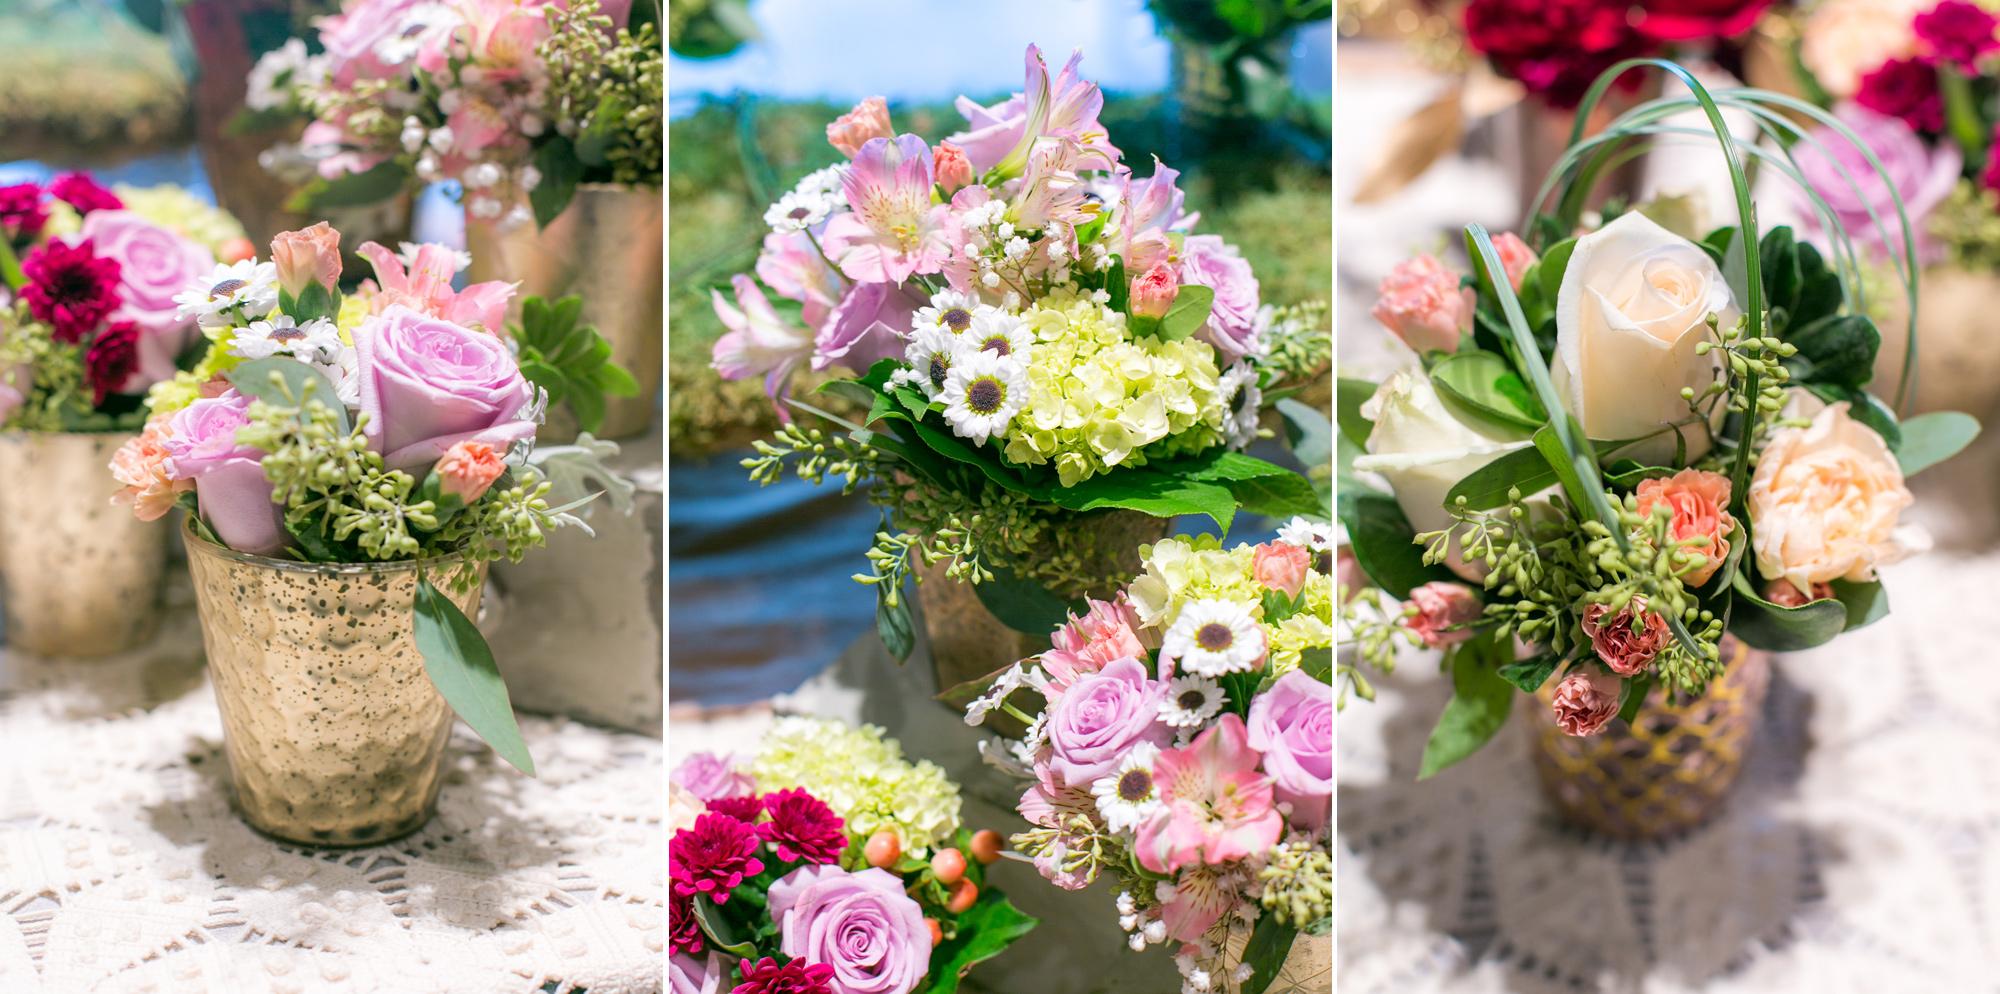 Post halifax wedding photographers 187 halifax indie wedding show the blossom shop izmirmasajfo